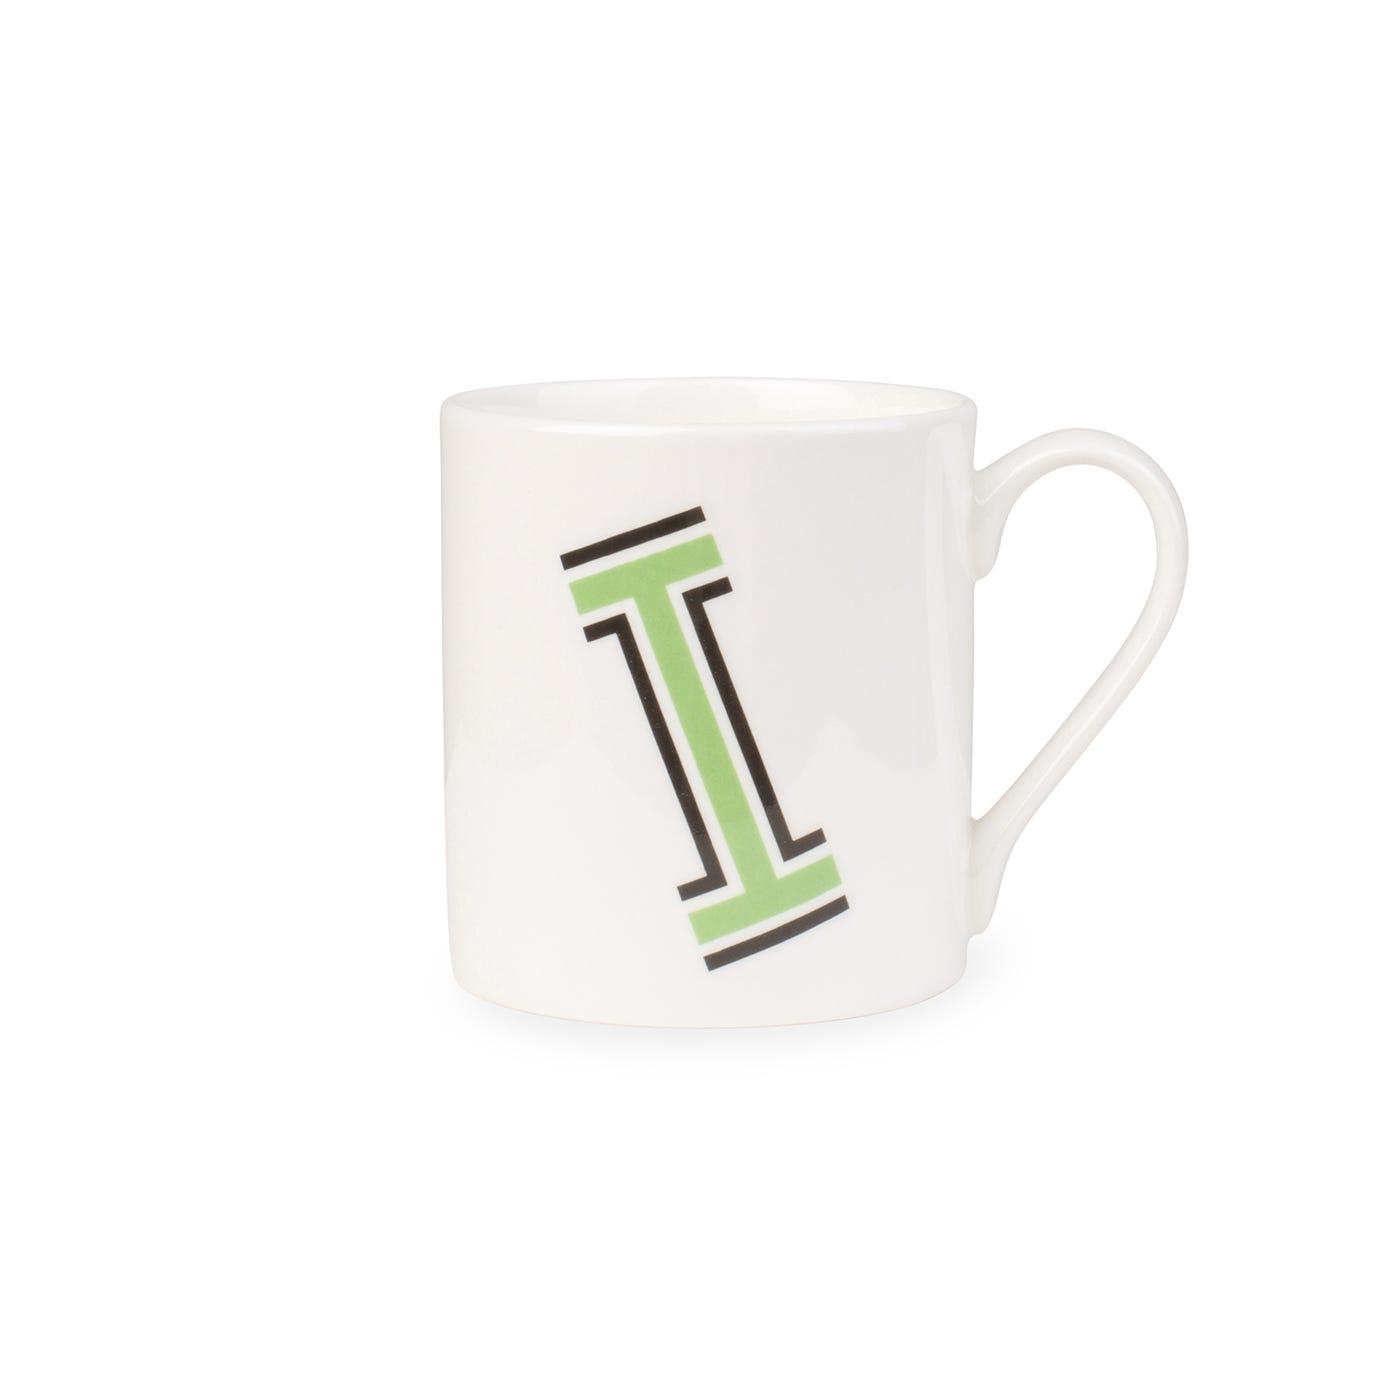 Heal's Heal's Heritage Alphabet Mug I